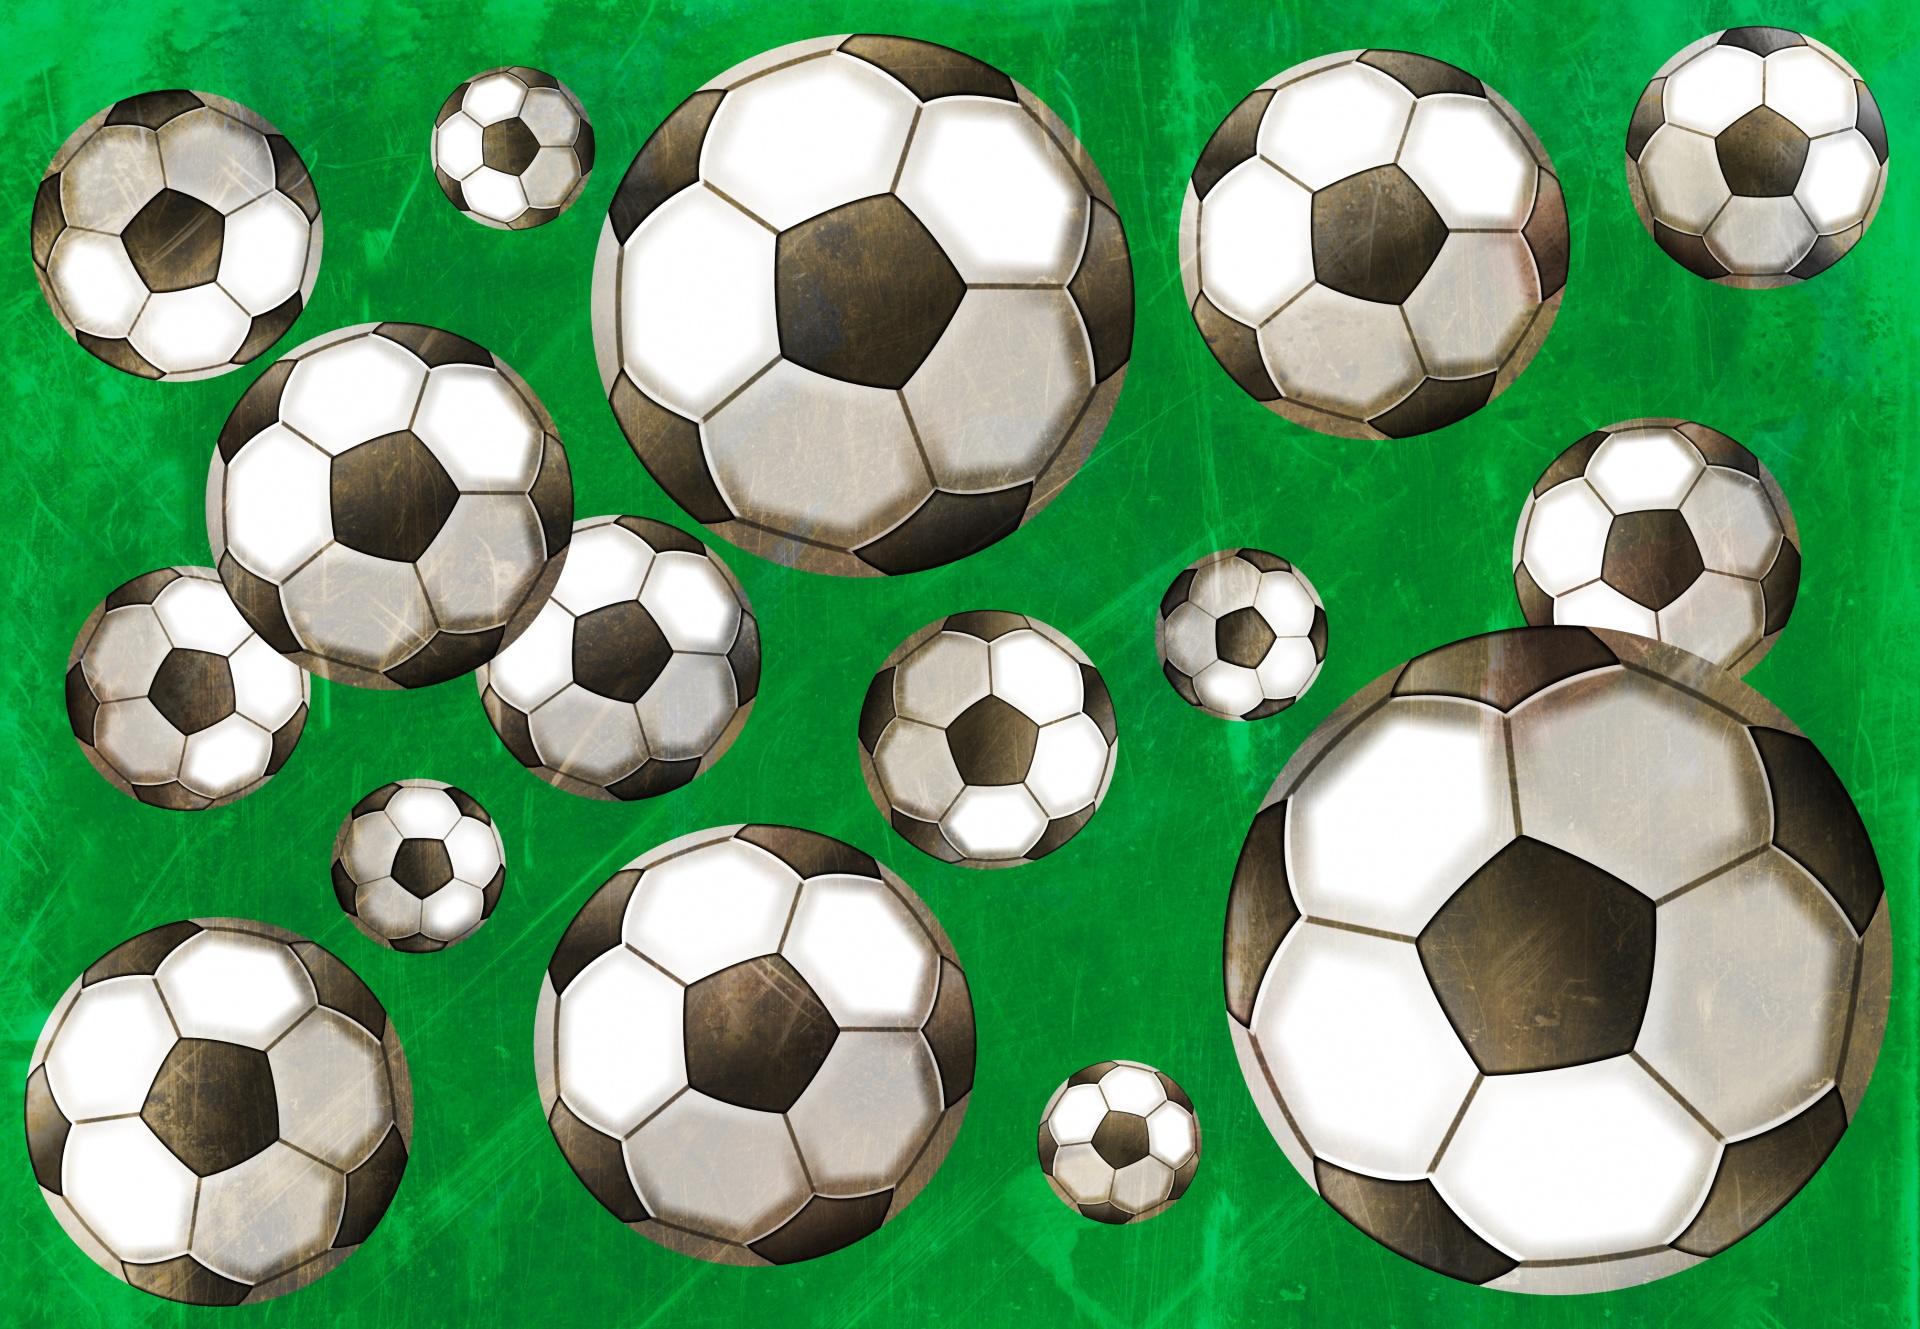 Ritchie Soccer (Register)